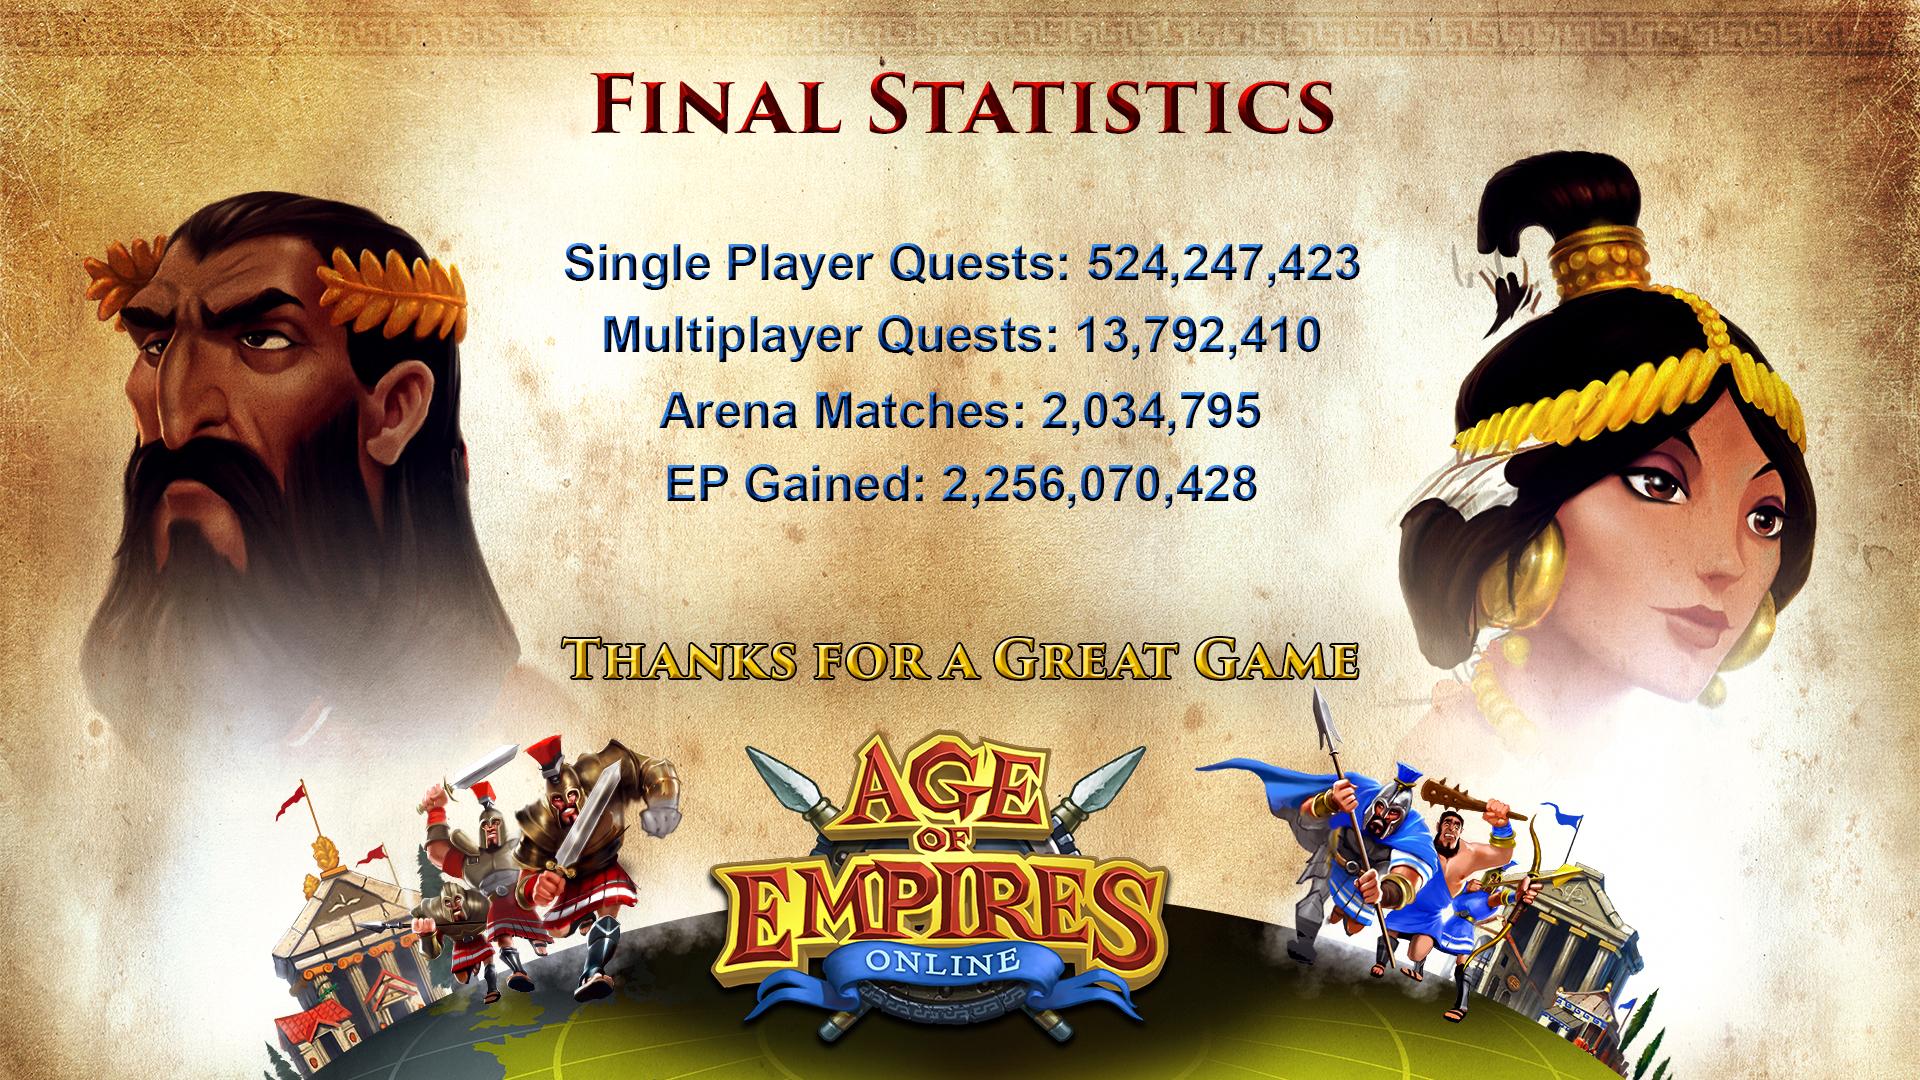 Age of empires online statistiche finali